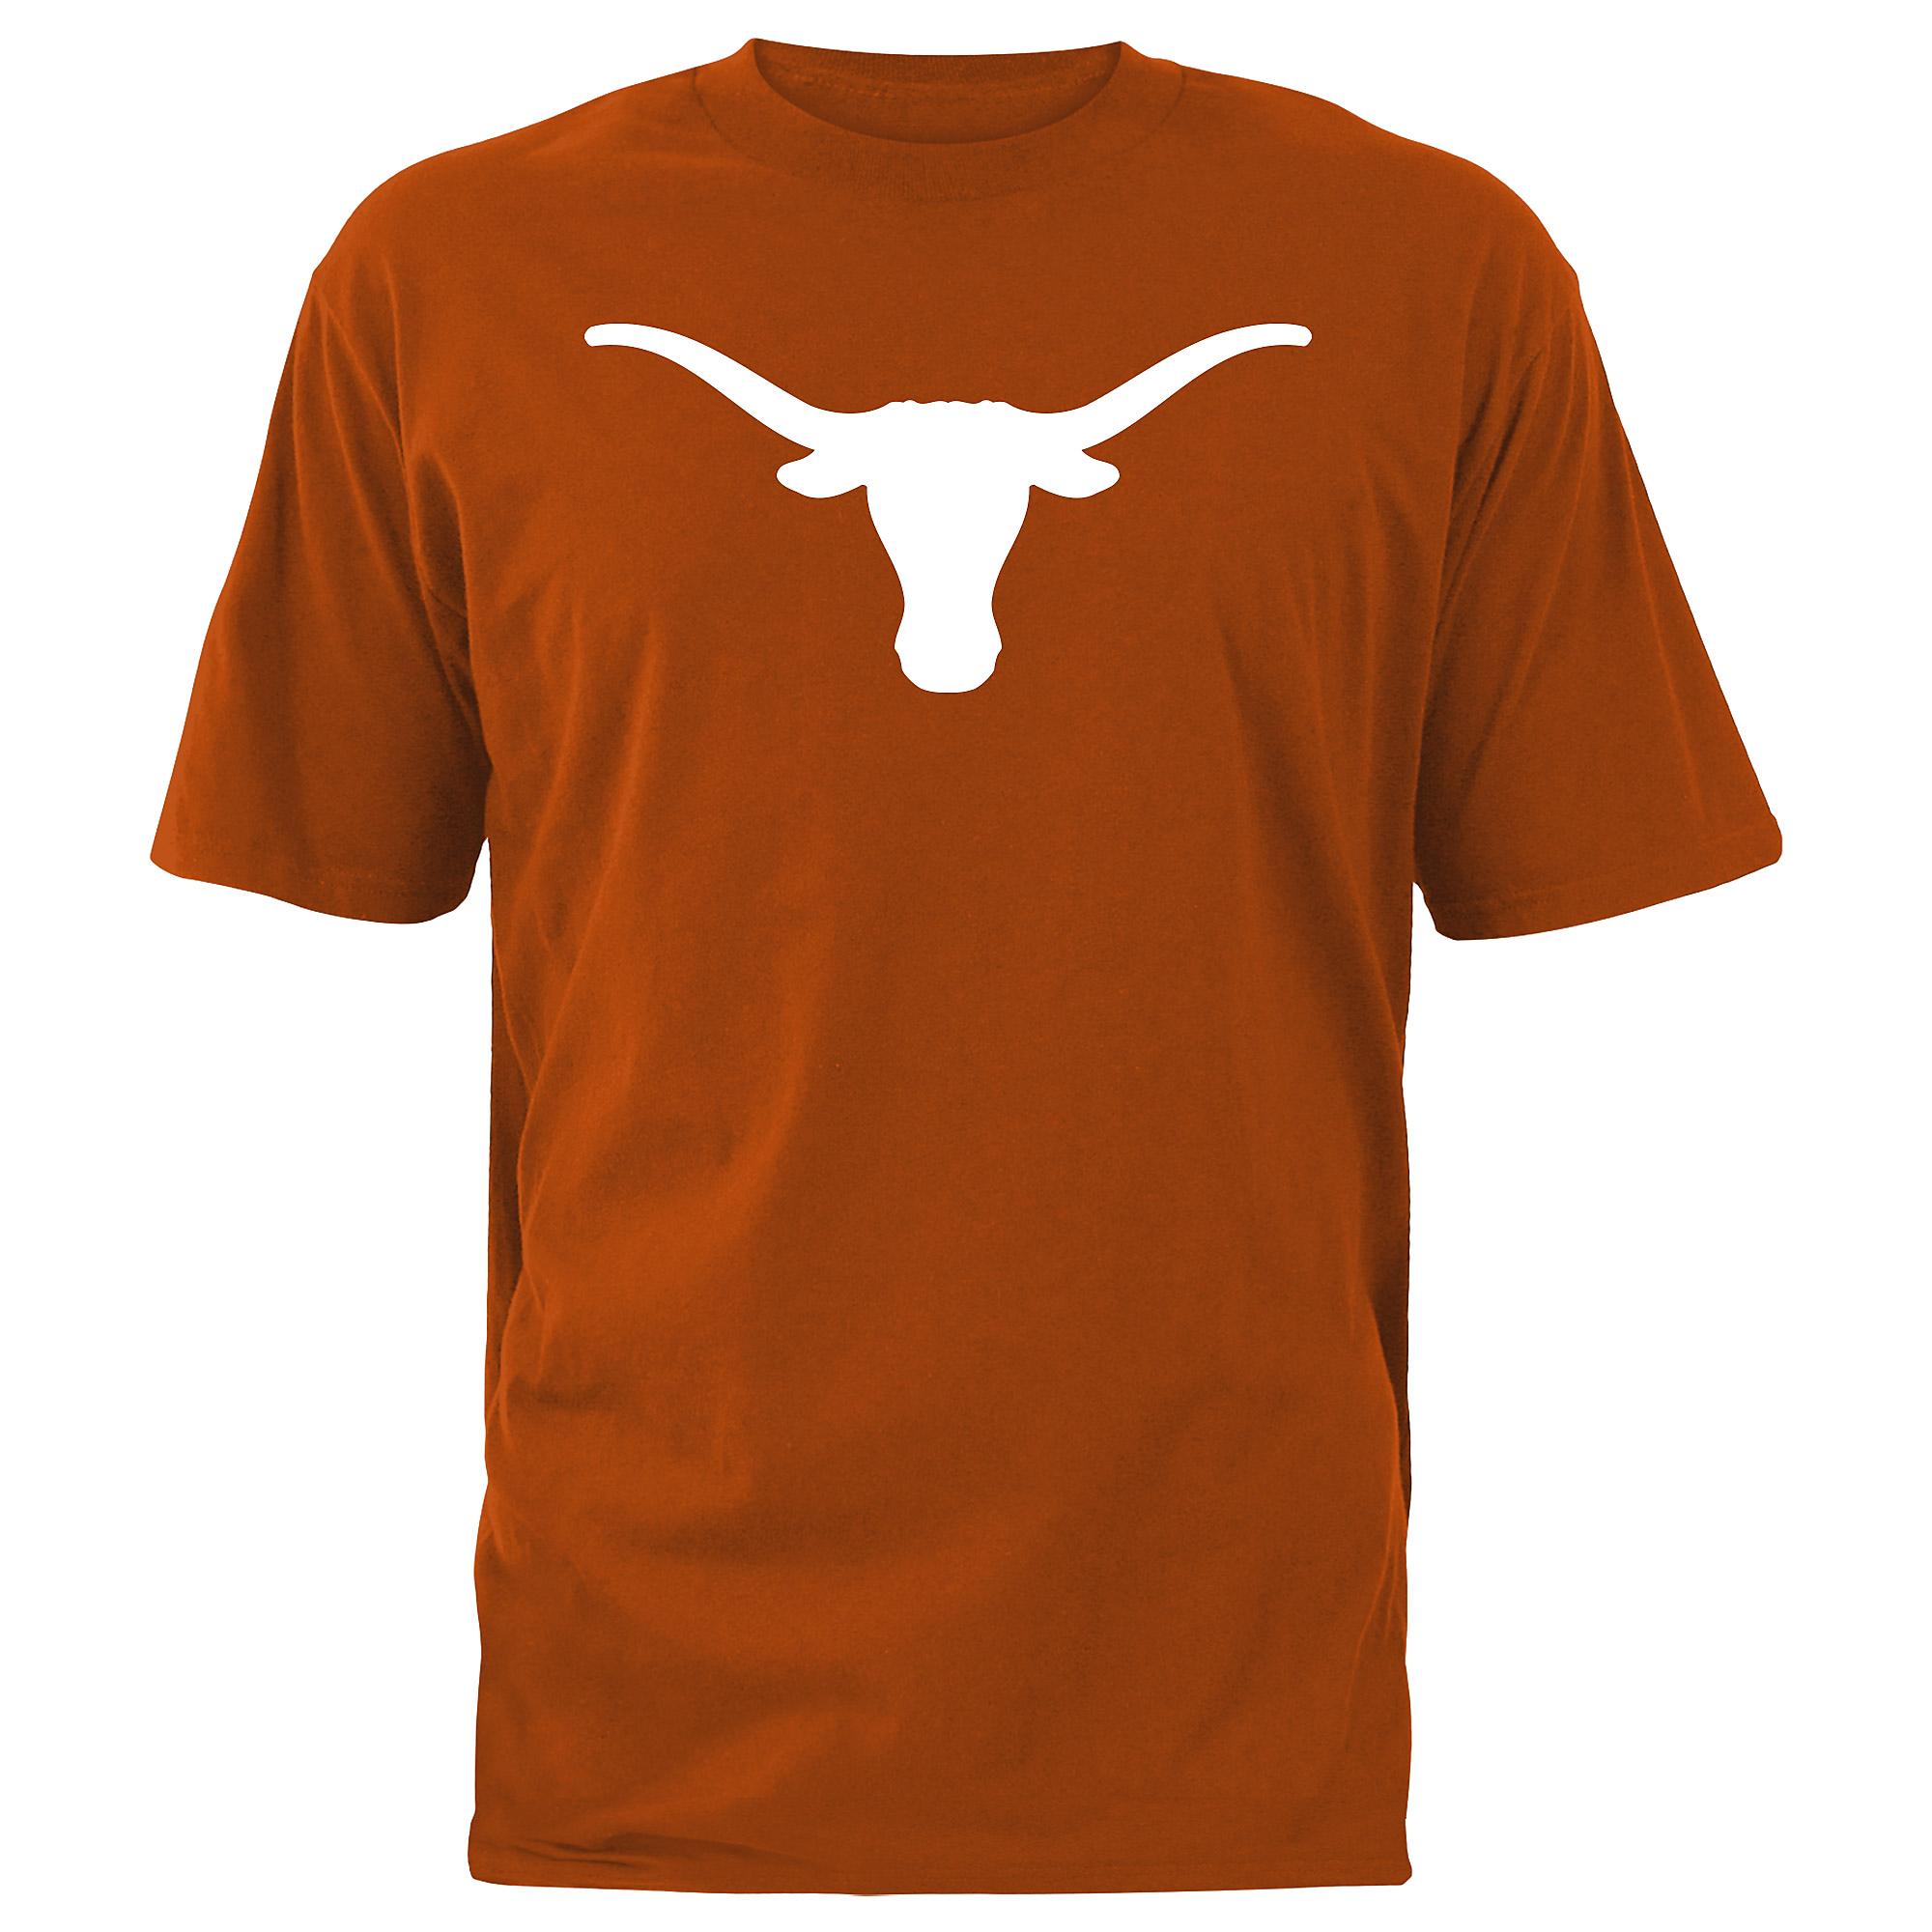 Texas Longhorns Silhouette Tee